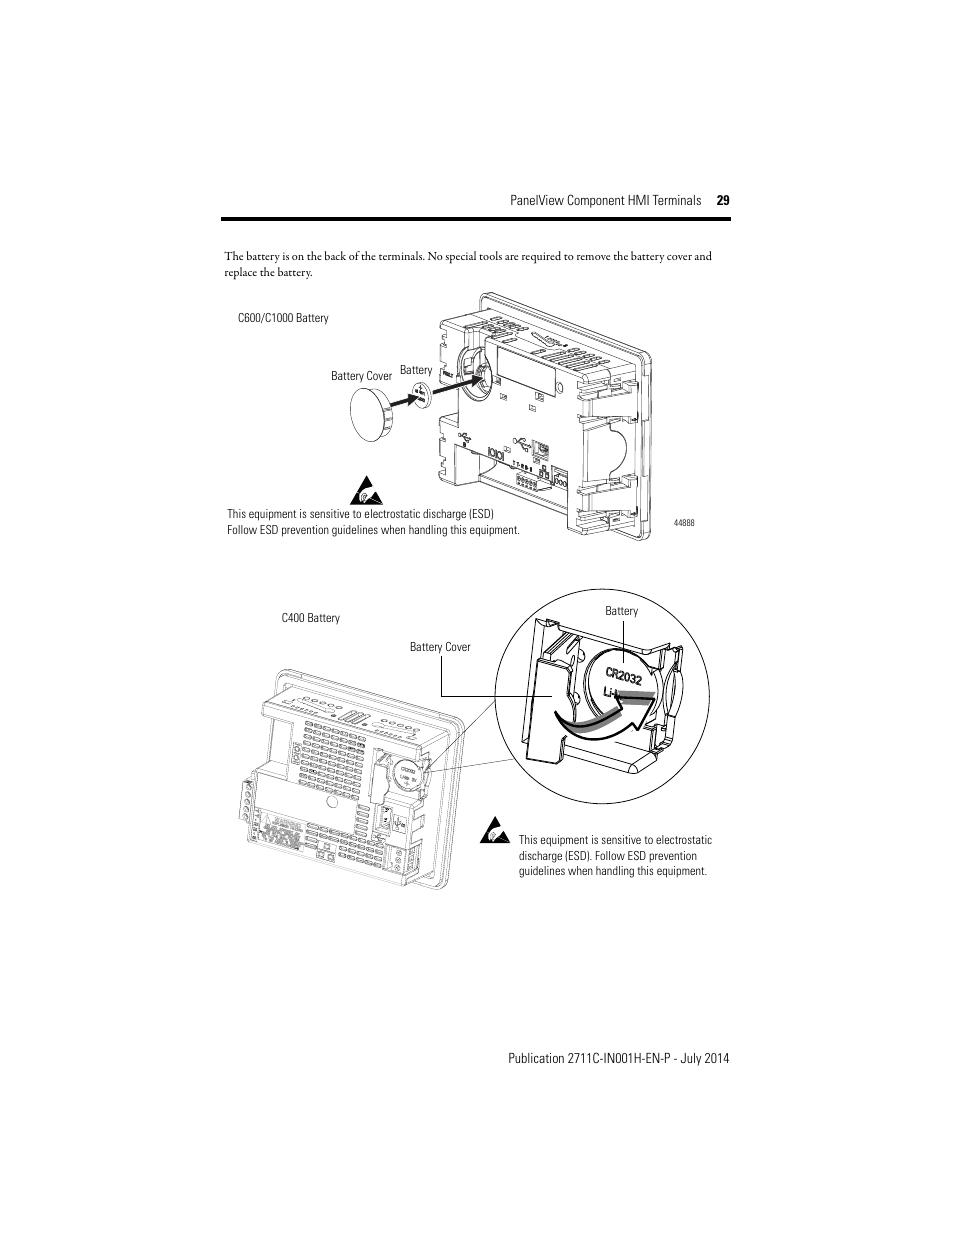 Rockwell Automation 2711C-xxxx PanelView Component HMI